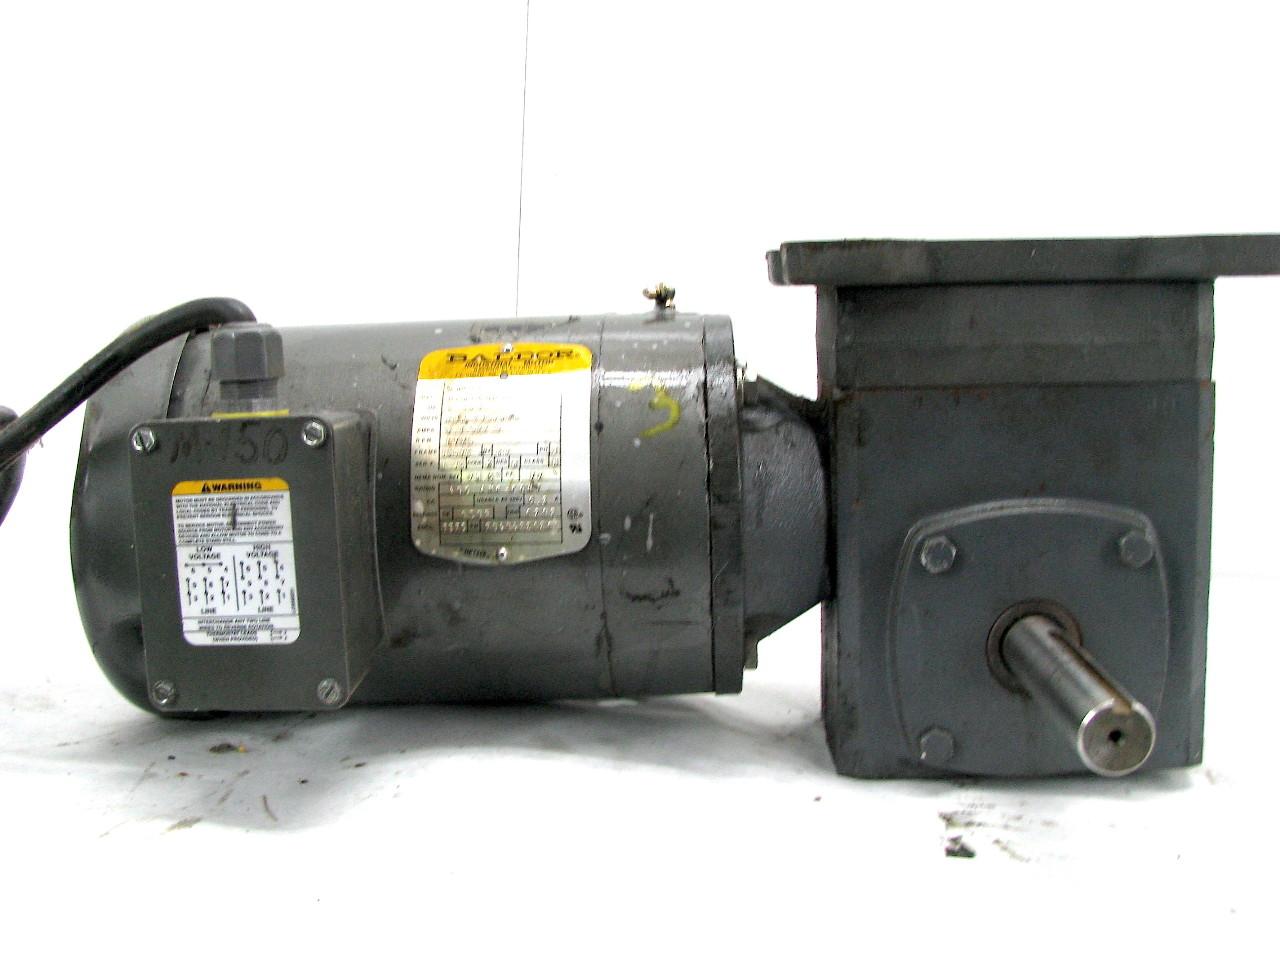 Baldor Vm3554t 1 5hp Motor W F 921 05 B7 J 5 1 Gear